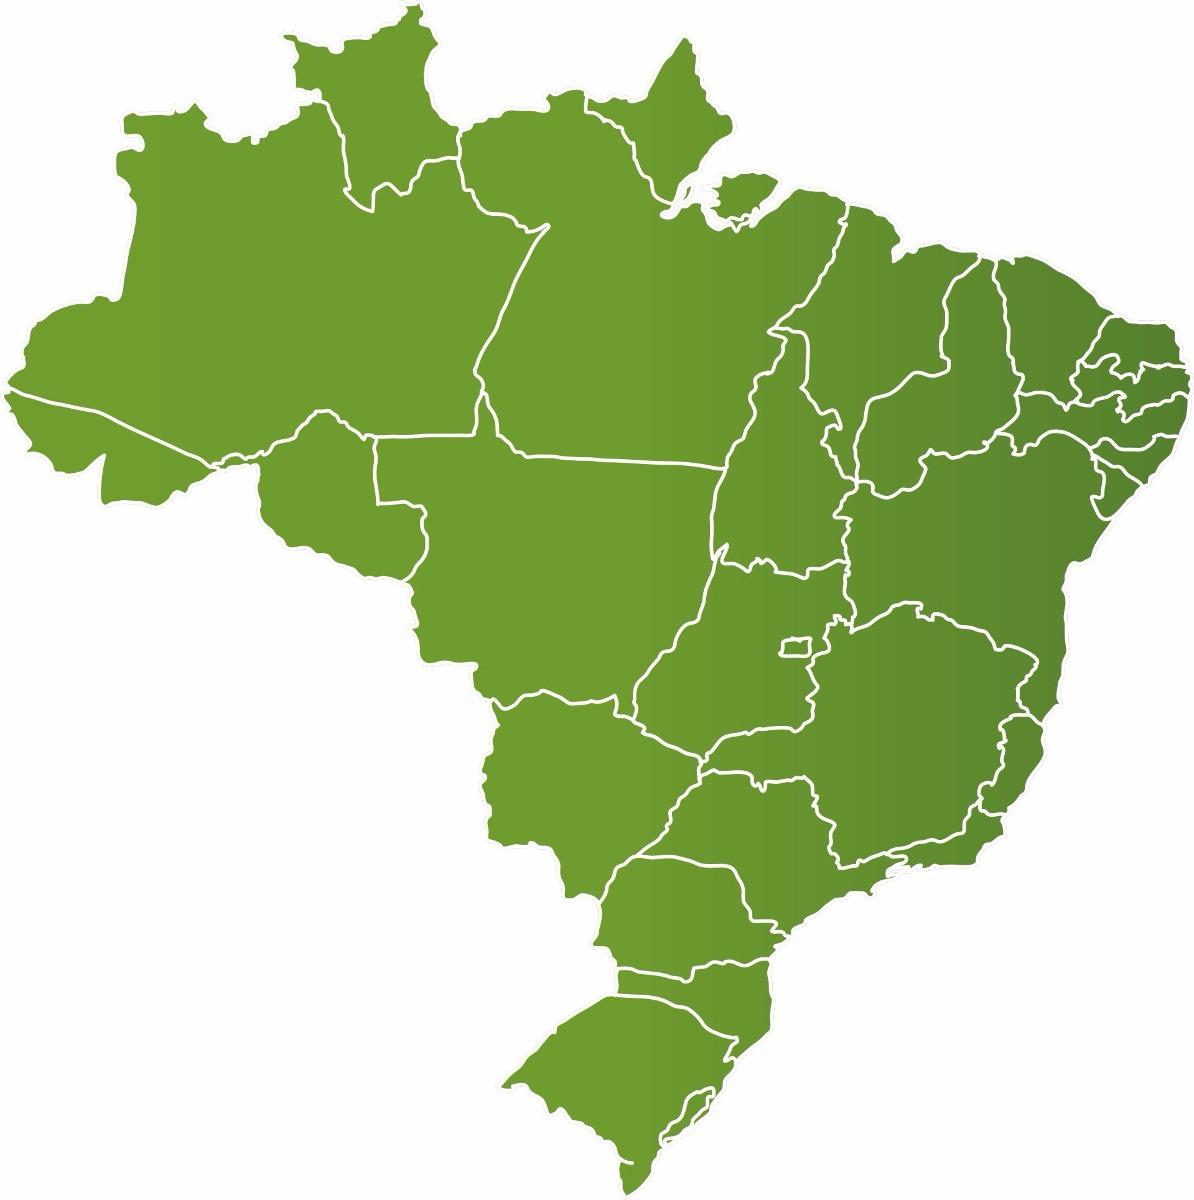 mapa brasil estados Adesivo Parede Mapa Brasil Estado Mapa 1 Metro X 1 Decoração   R  mapa brasil estados